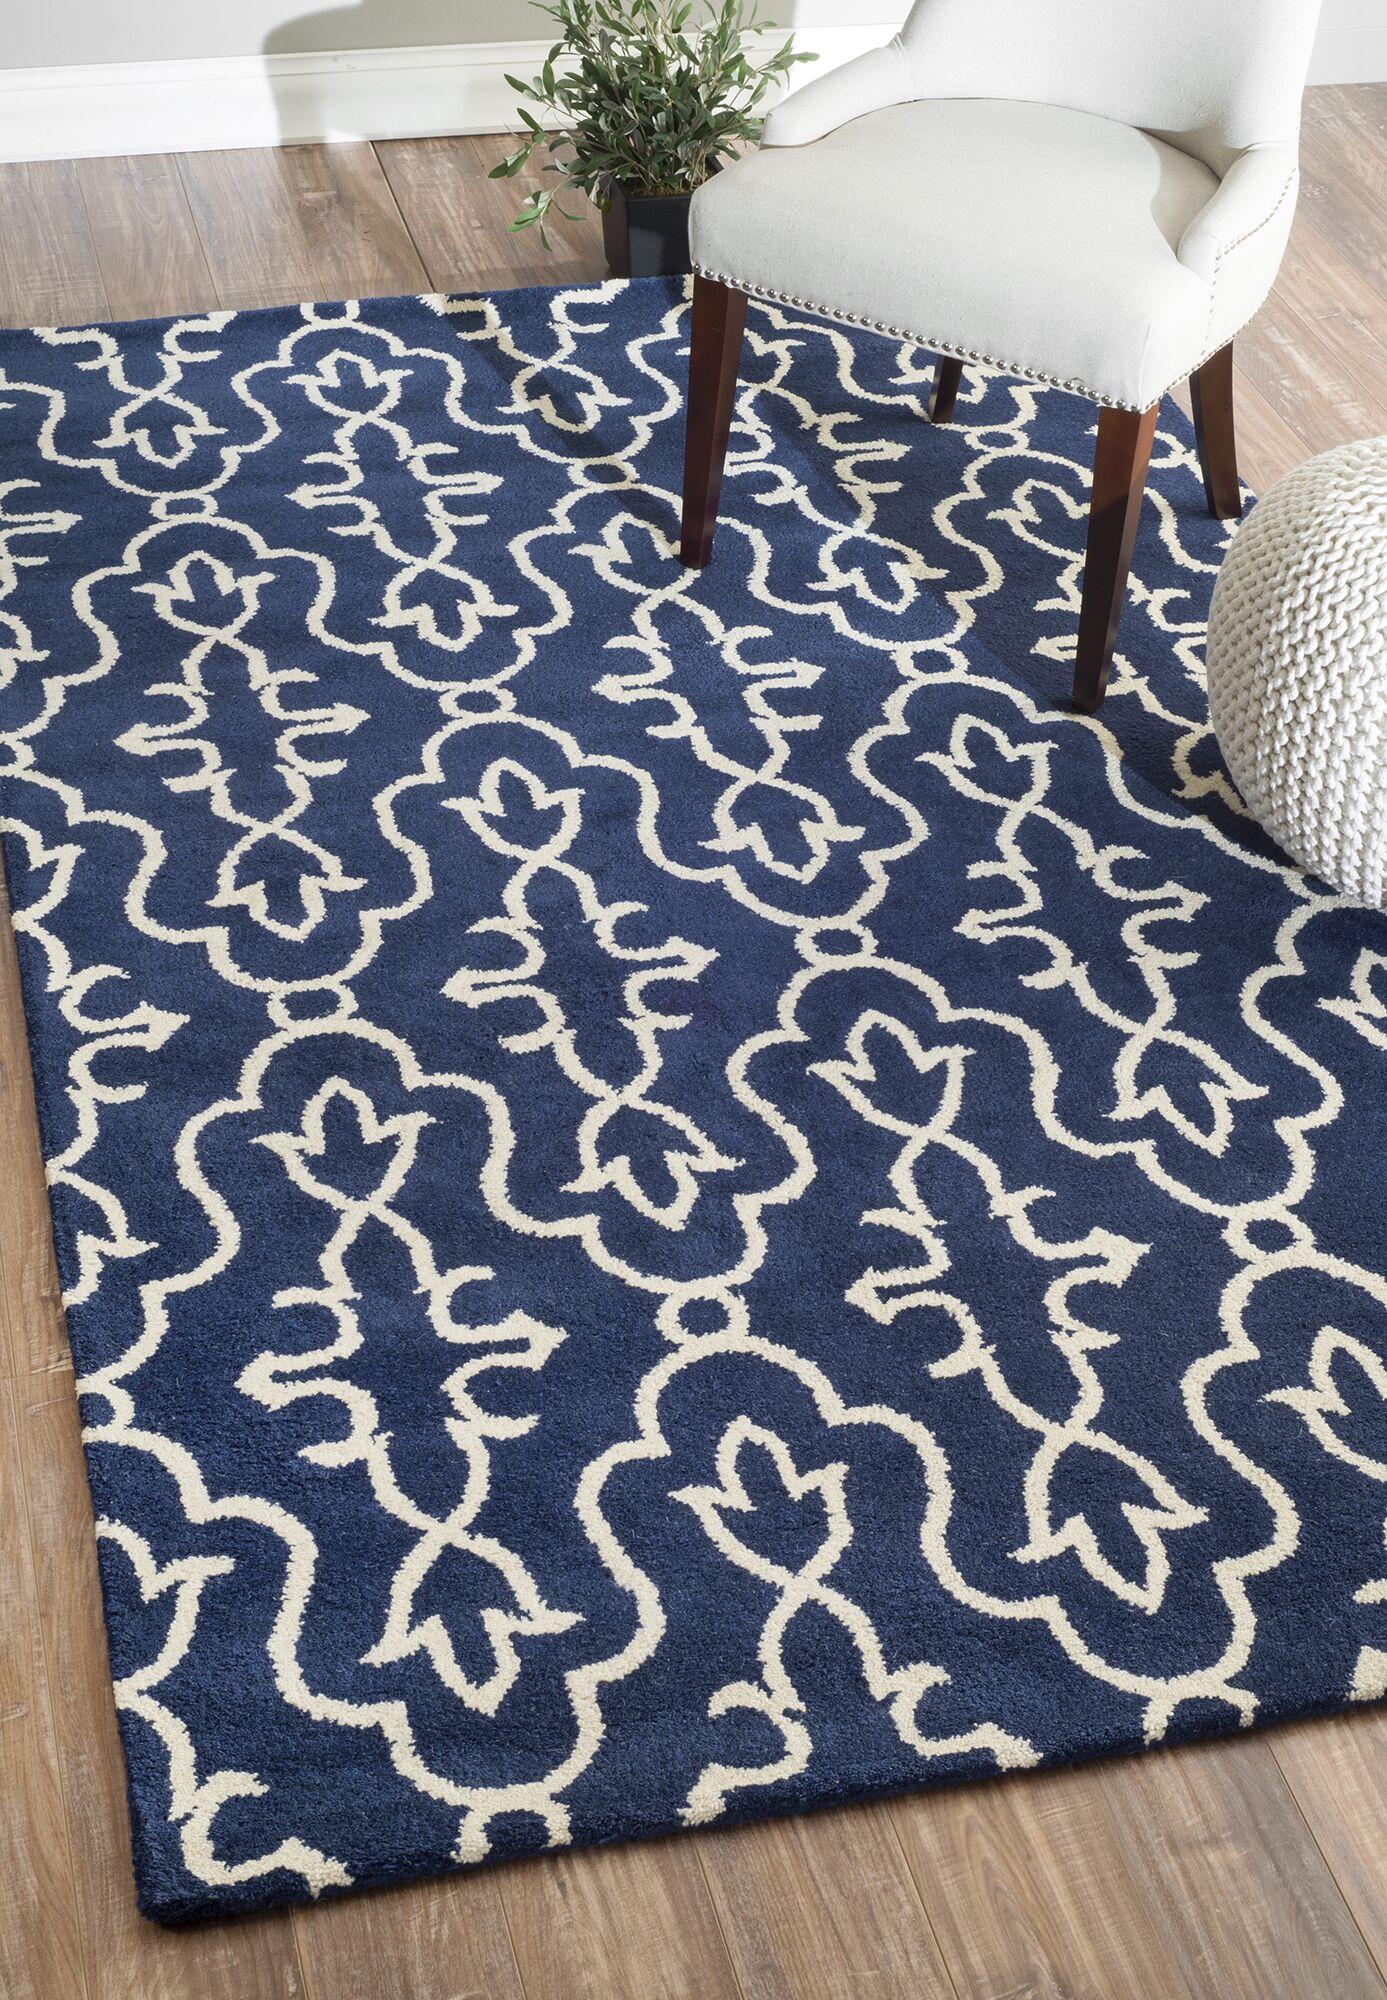 Amalfi Hand-Tufted Wool Navy Area Rug Rug Size: Rectangle 7'6